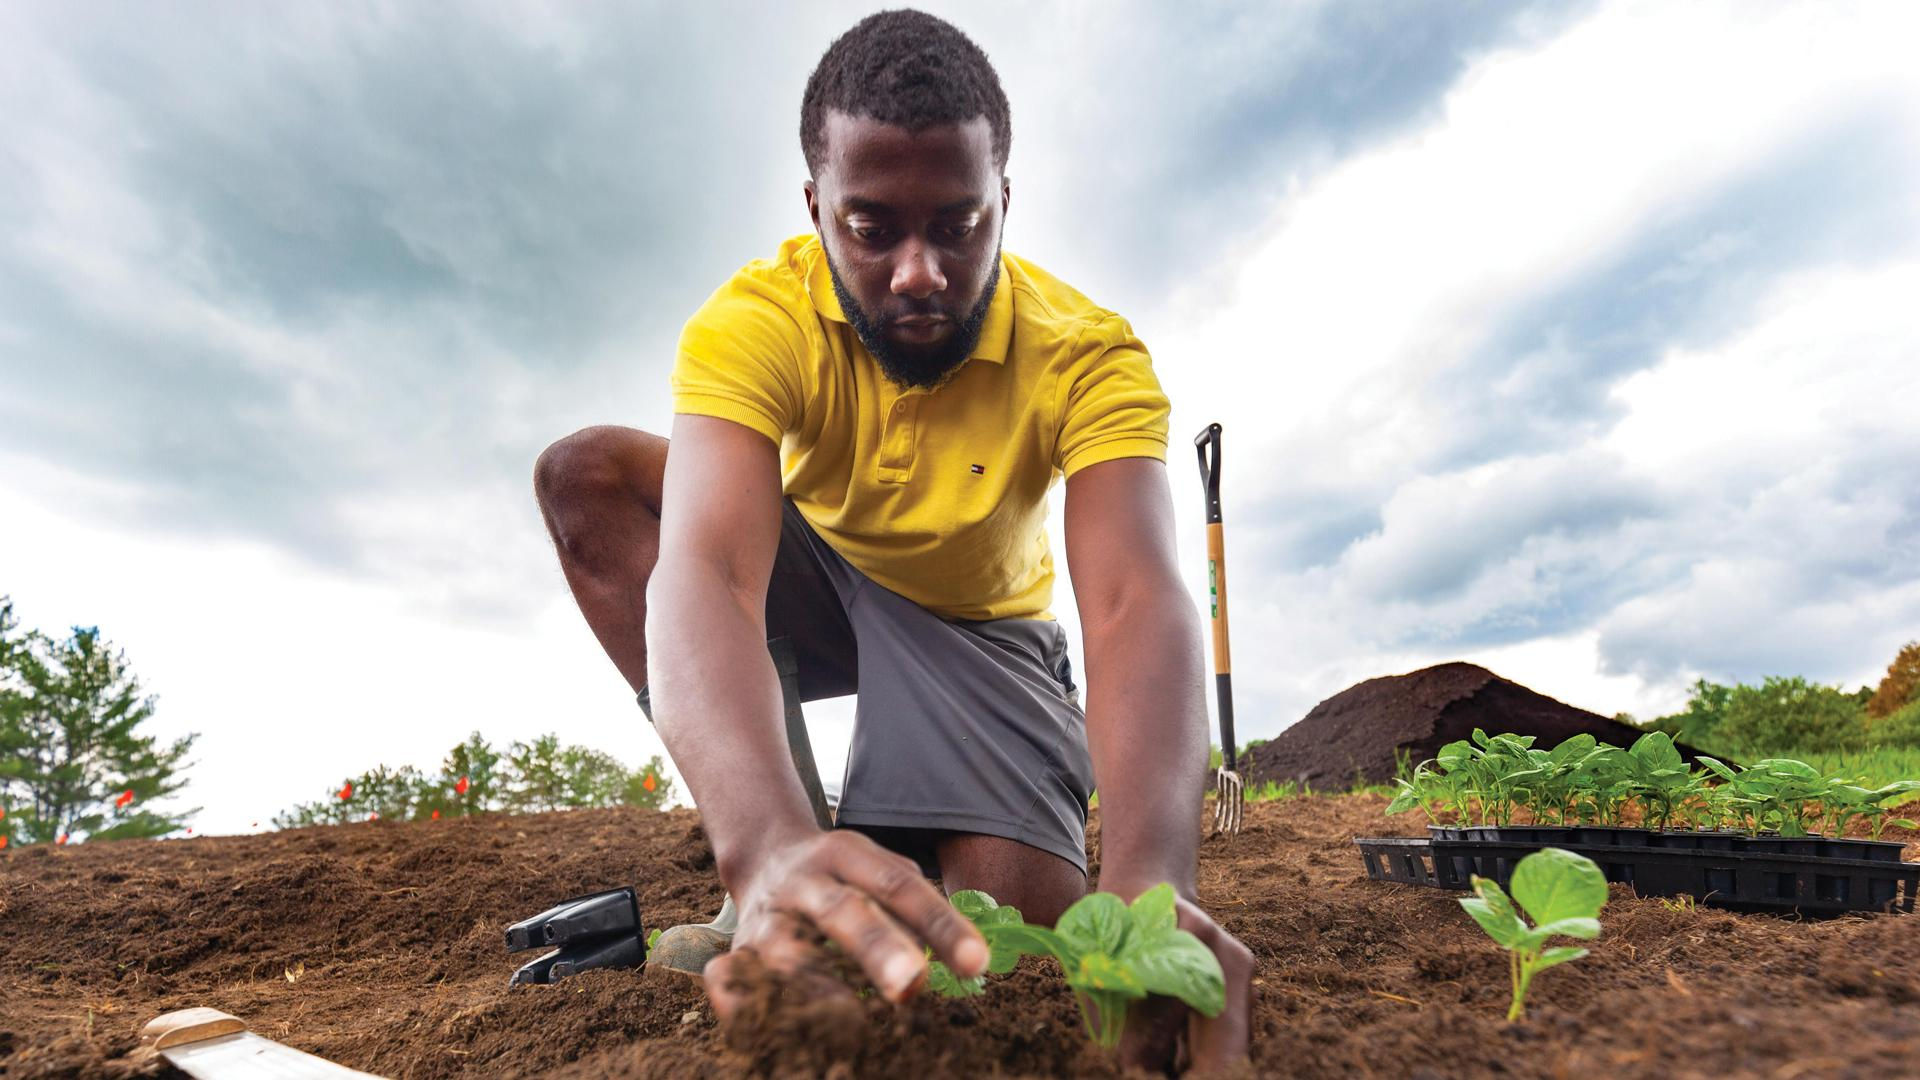 The future of farming is BIPOC | Soniel Gordon set up Sunny Boy Farms in Pickering